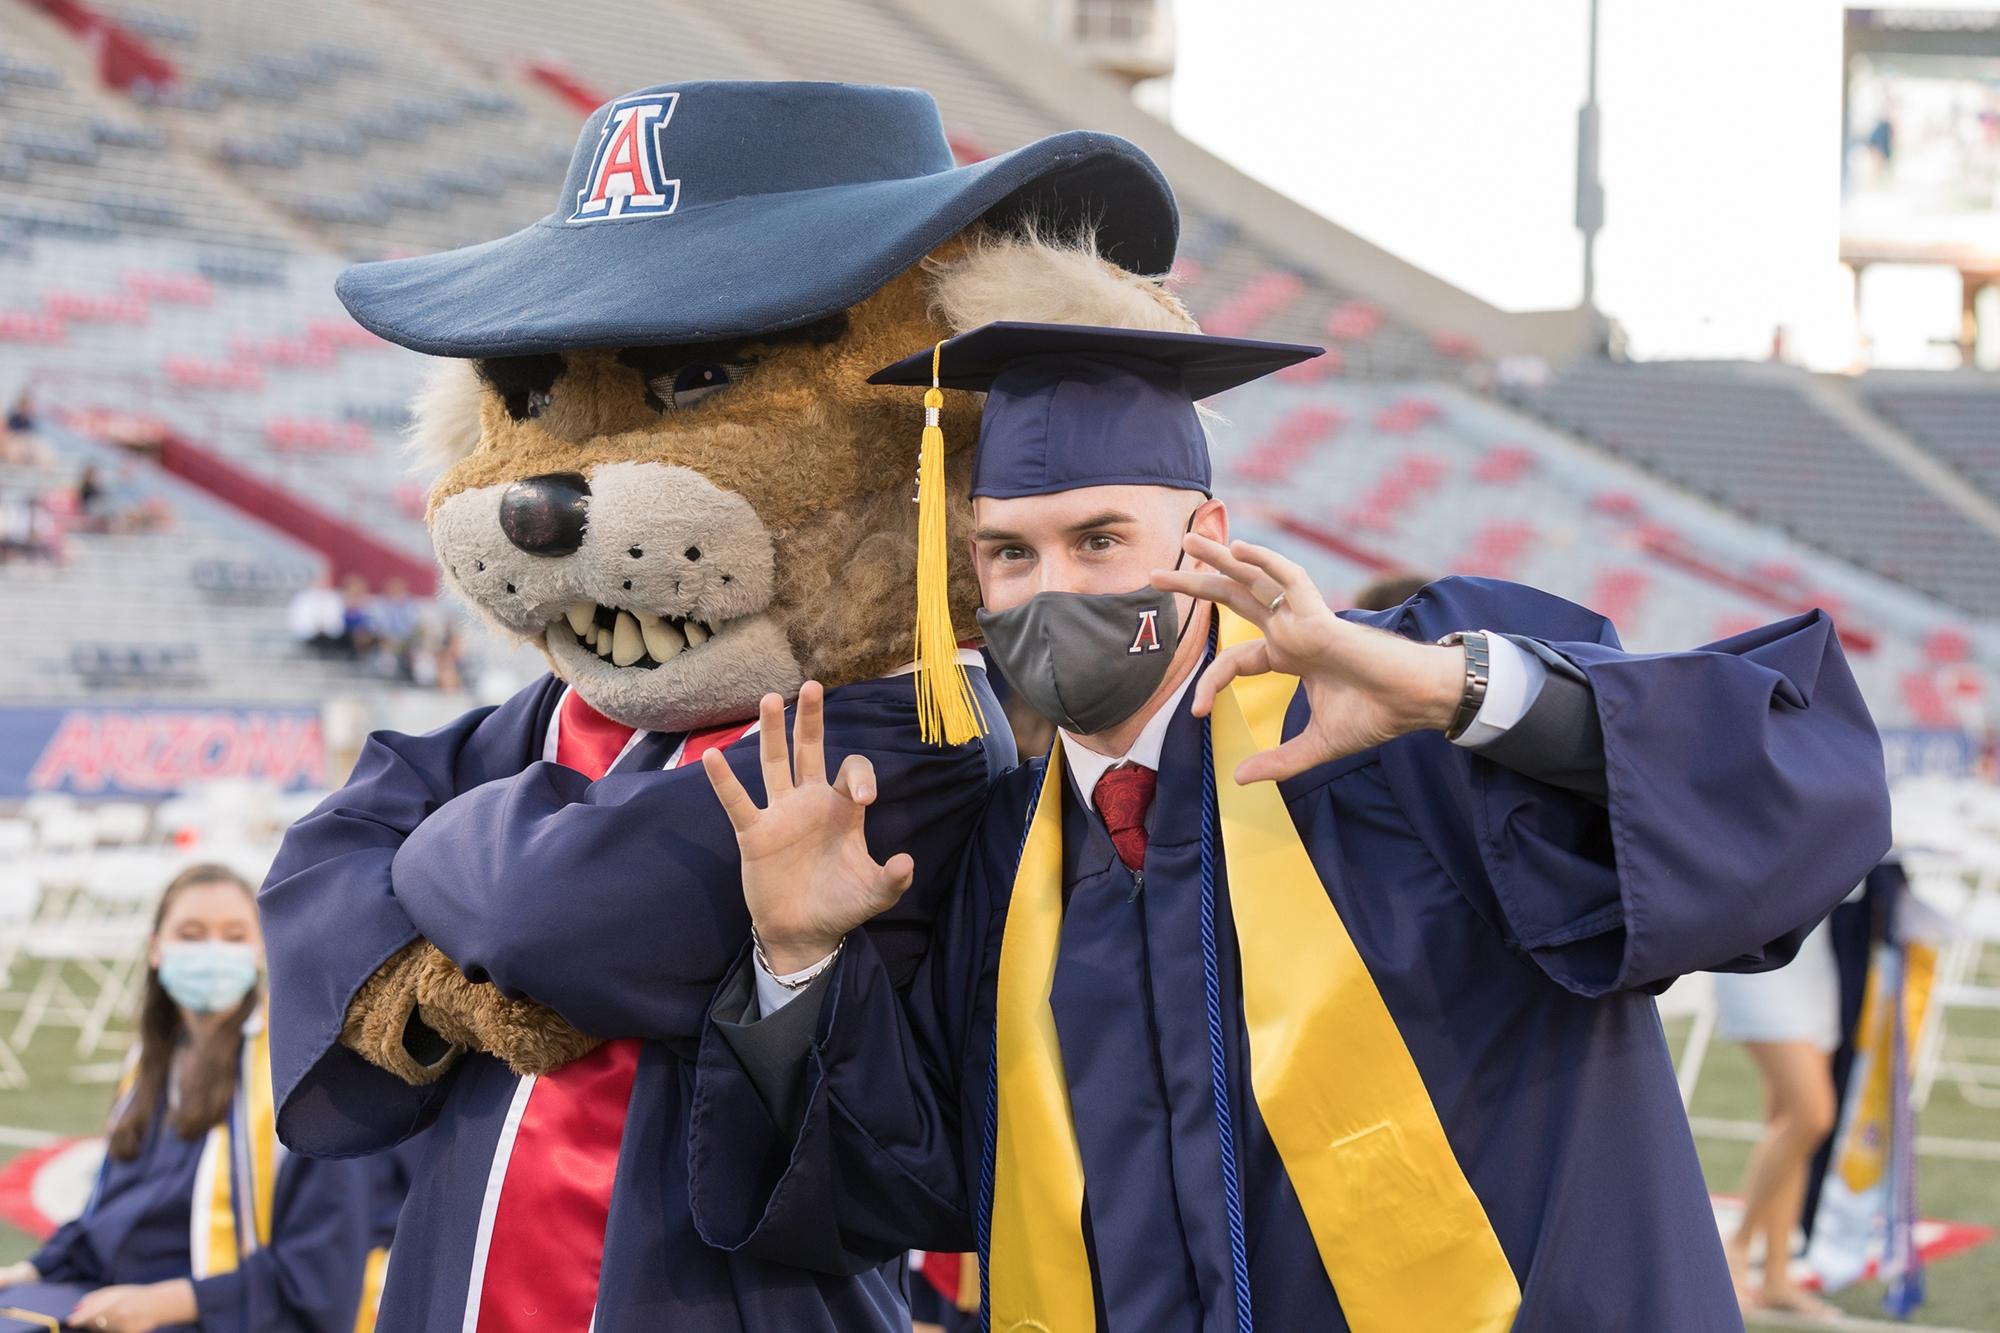 students at a graduation ceremony